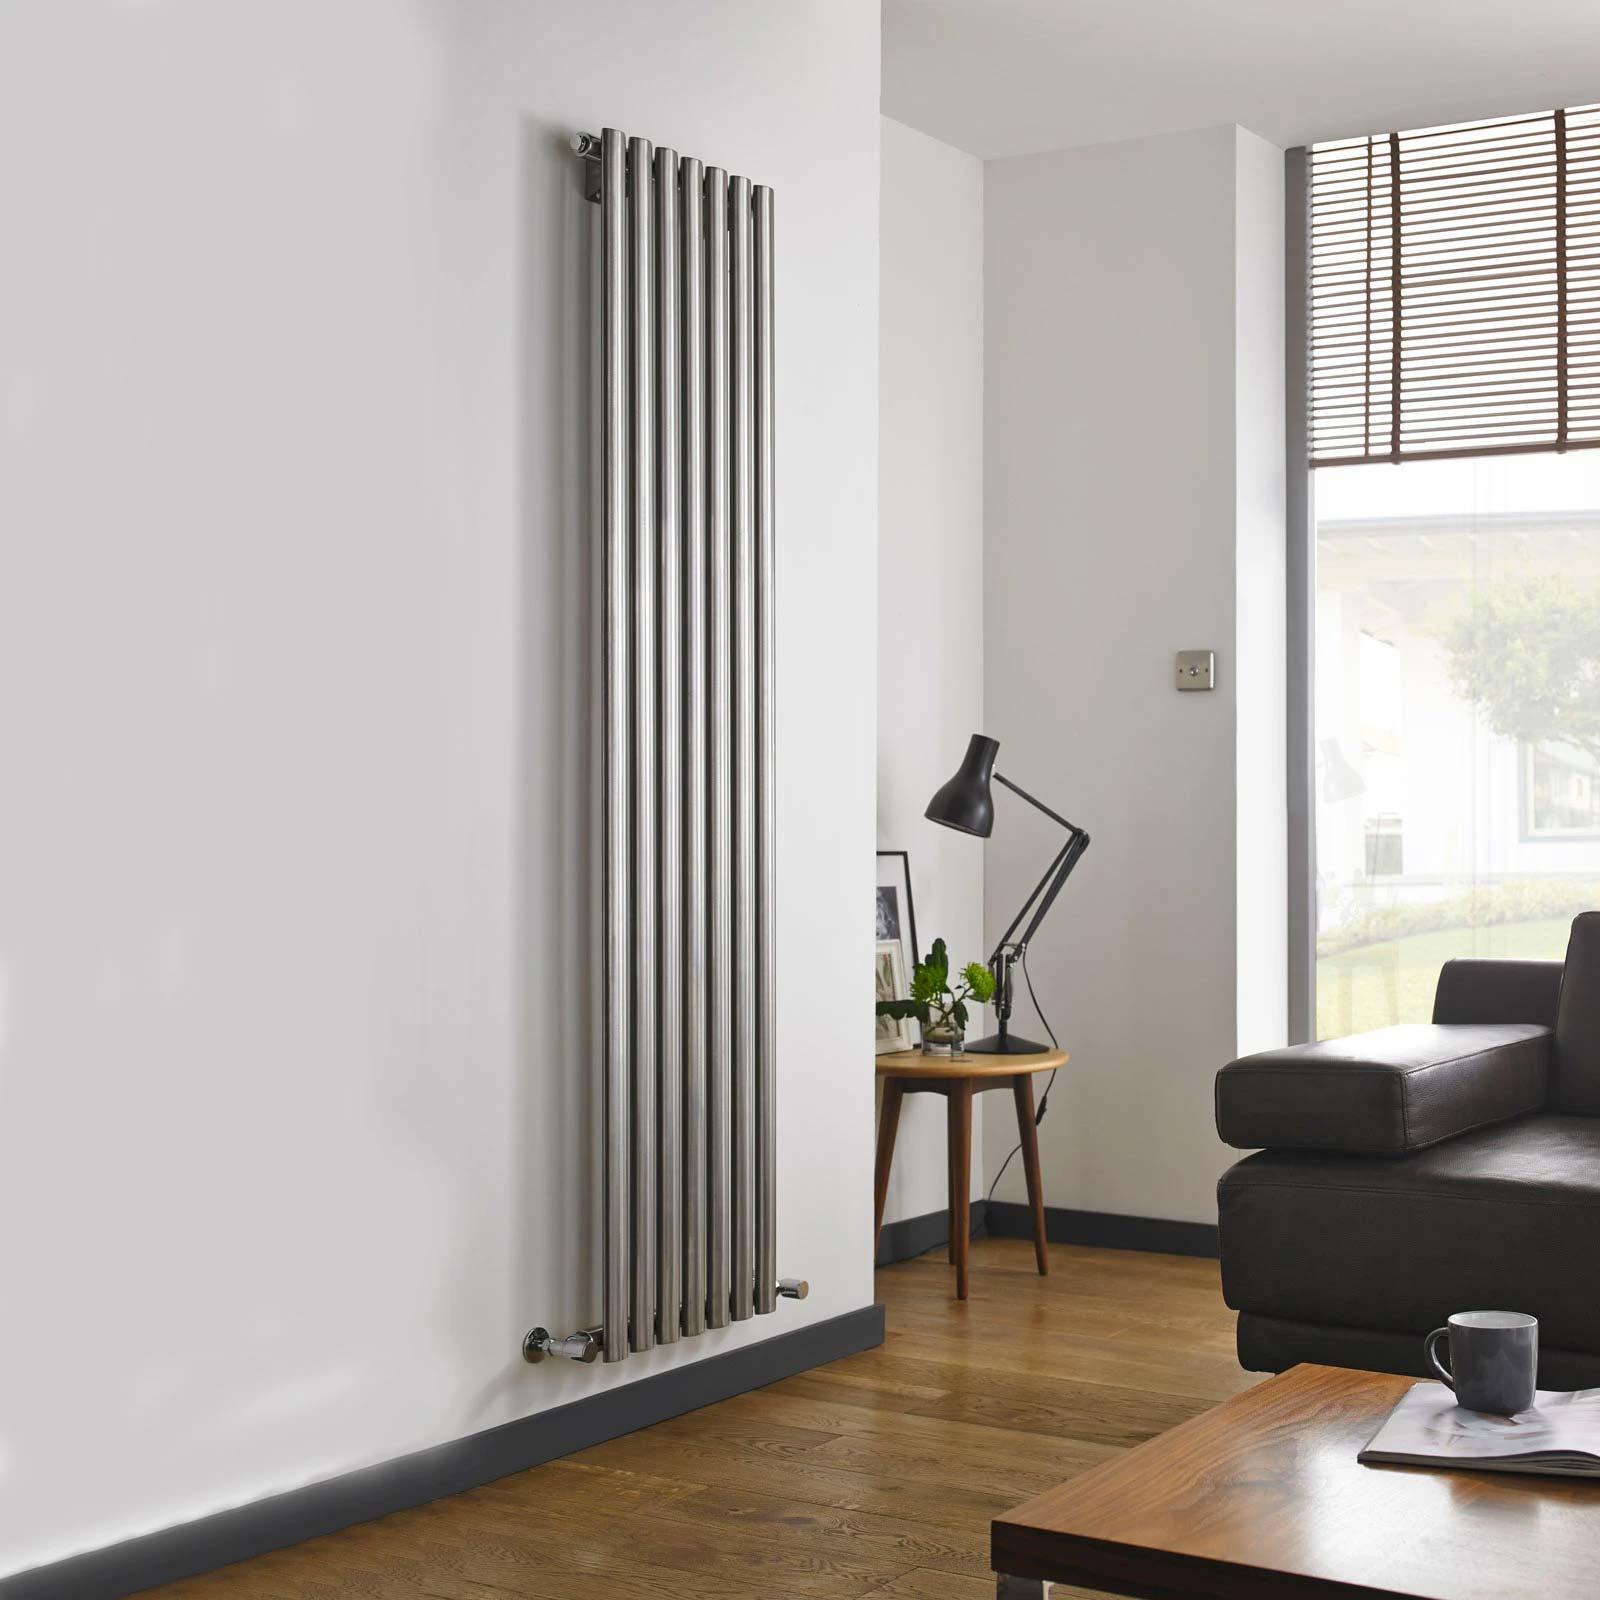 Verticale RVS radiator in de woonkamer